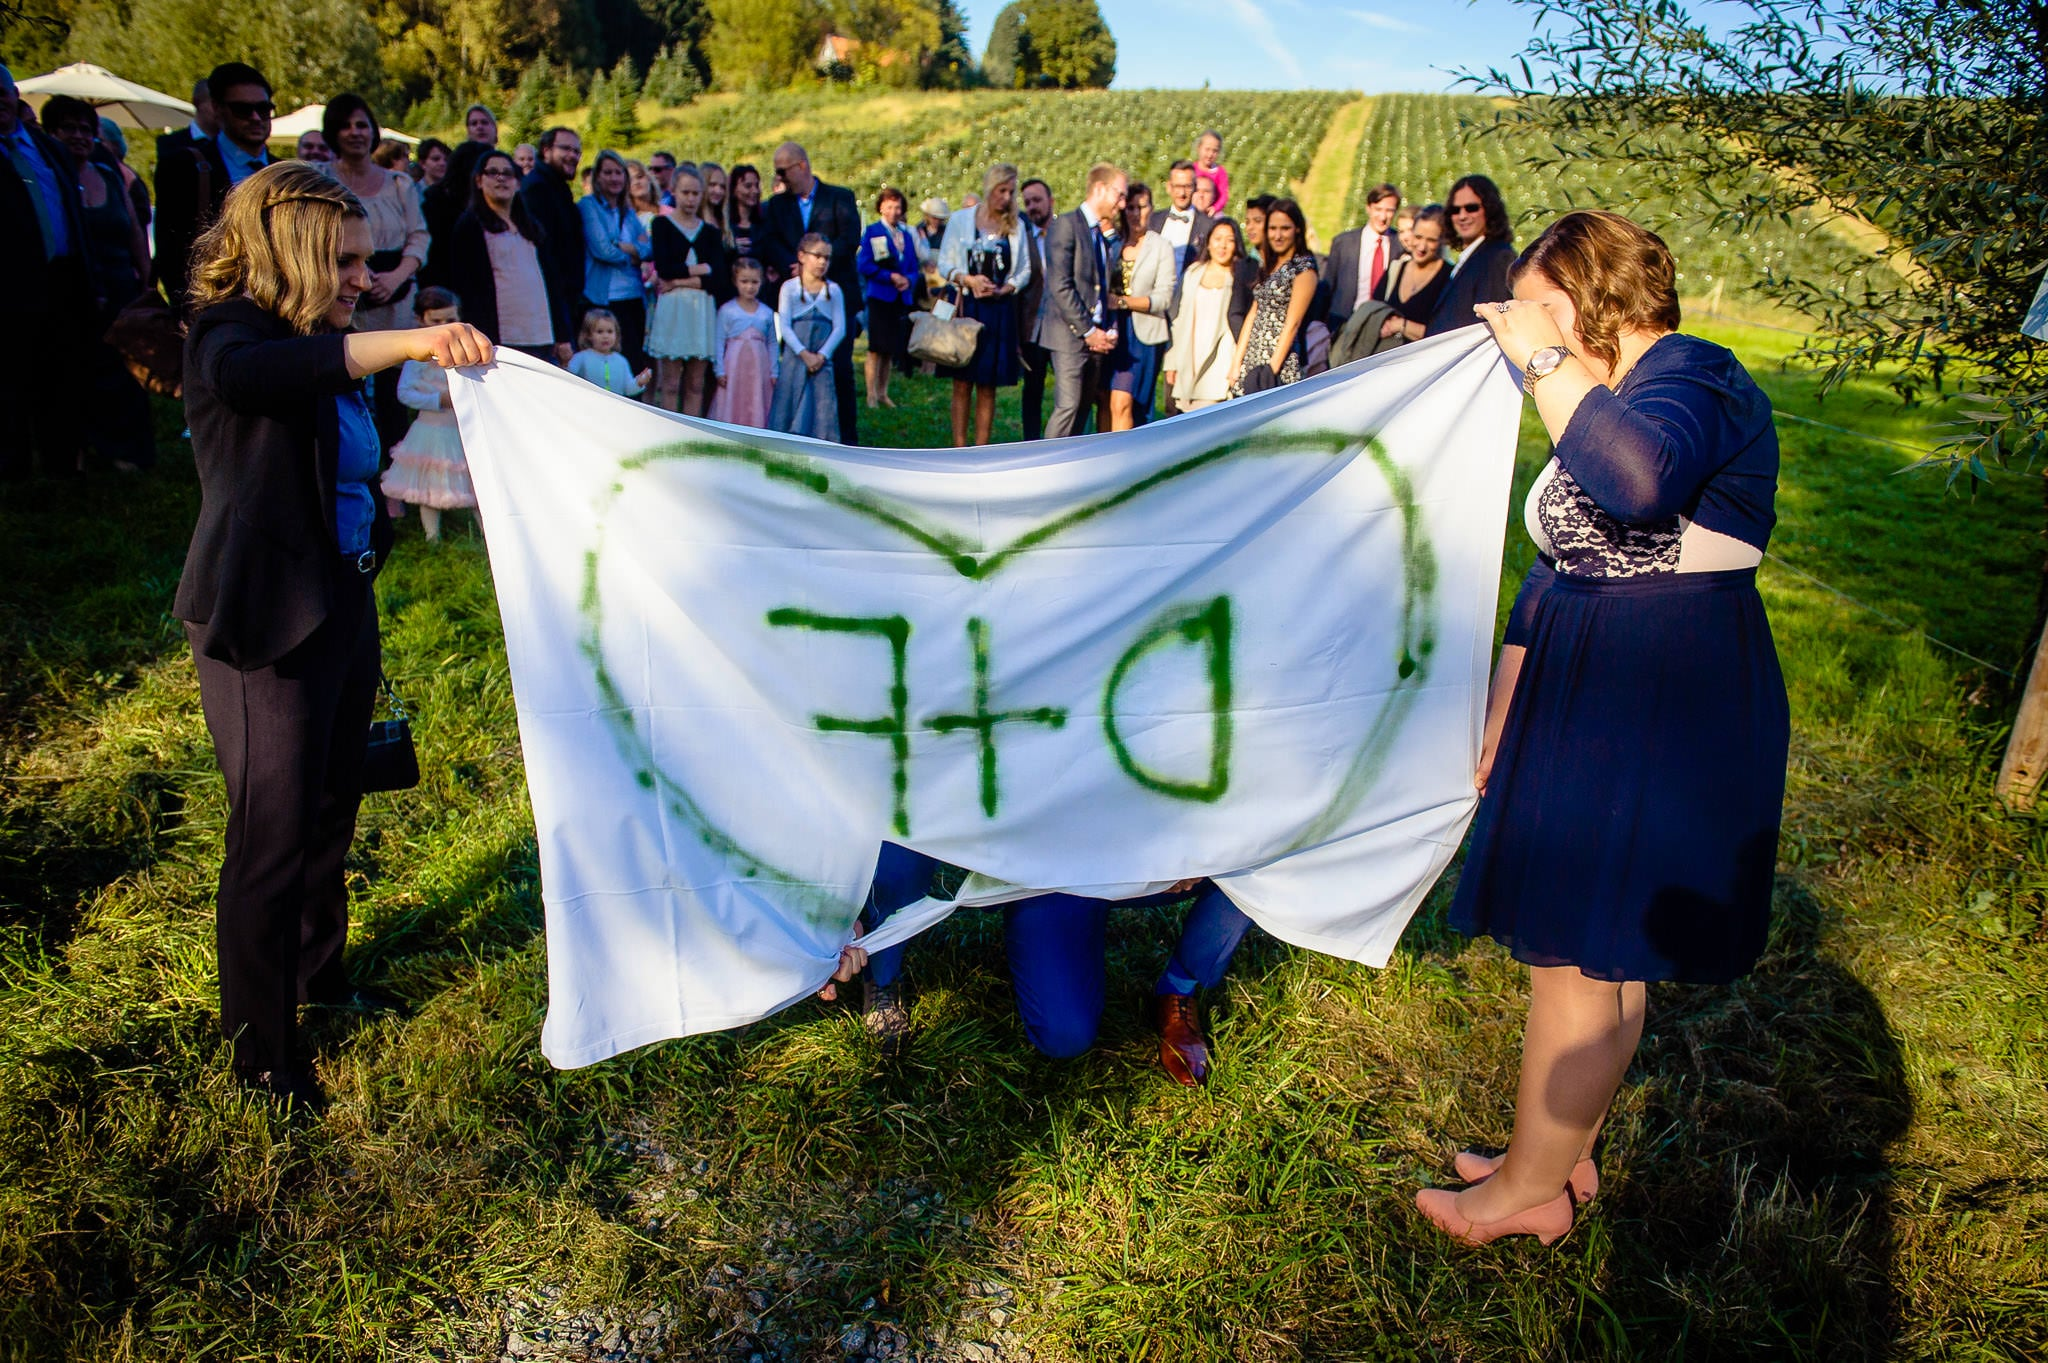 Freie Trauung in Ratingen